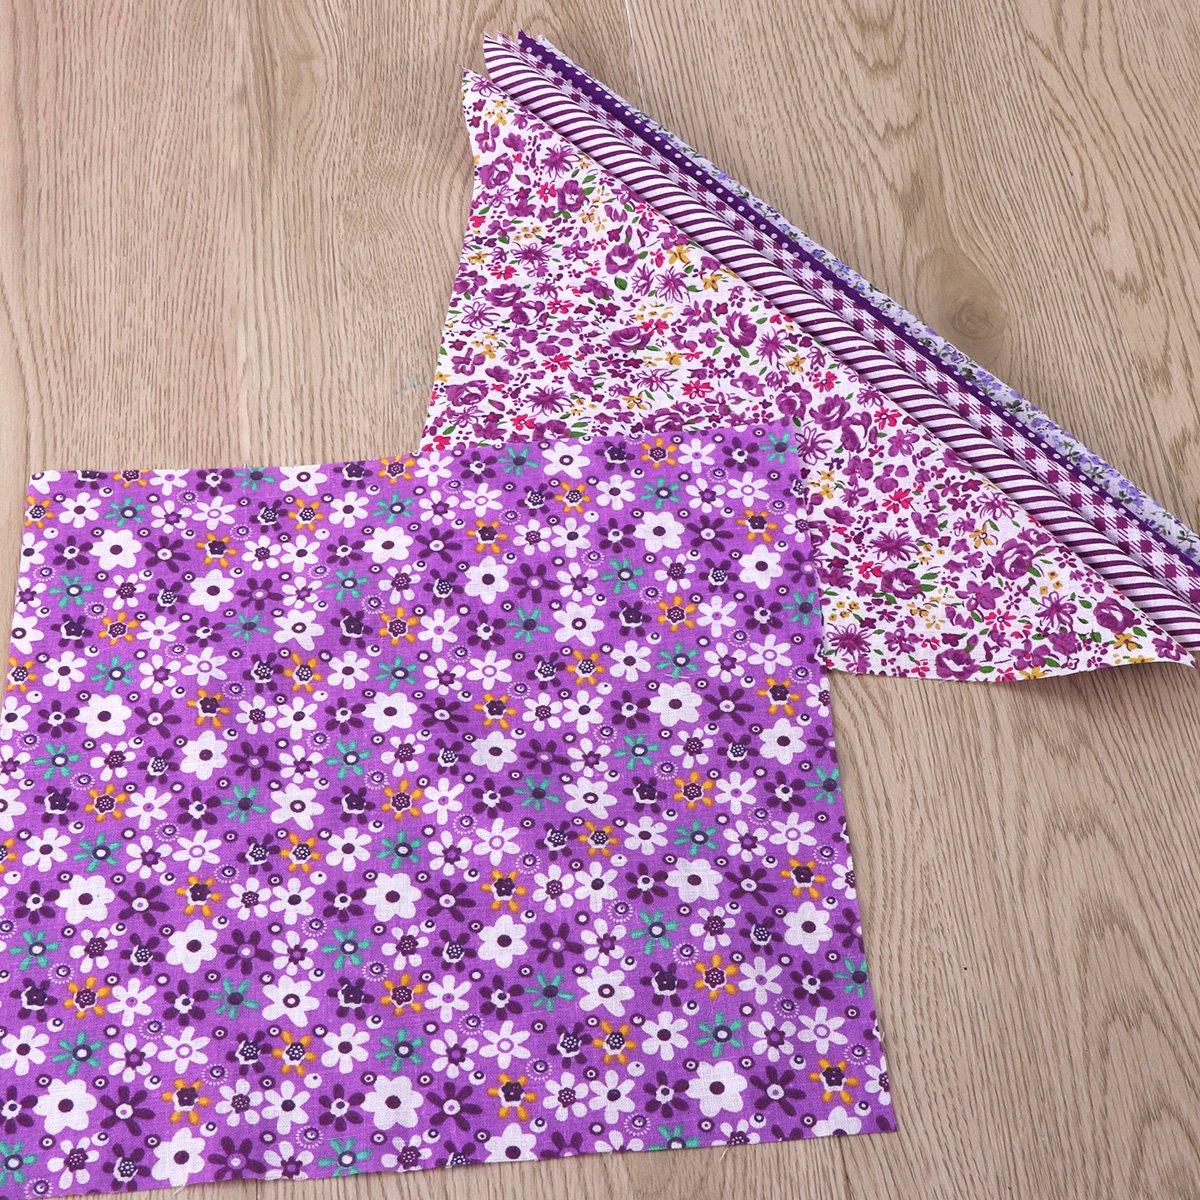 morado 6pcs cuadrados Bundle rosenice Floral algod/ón tela hoja costura Craft DIY gamuza de Patchwork